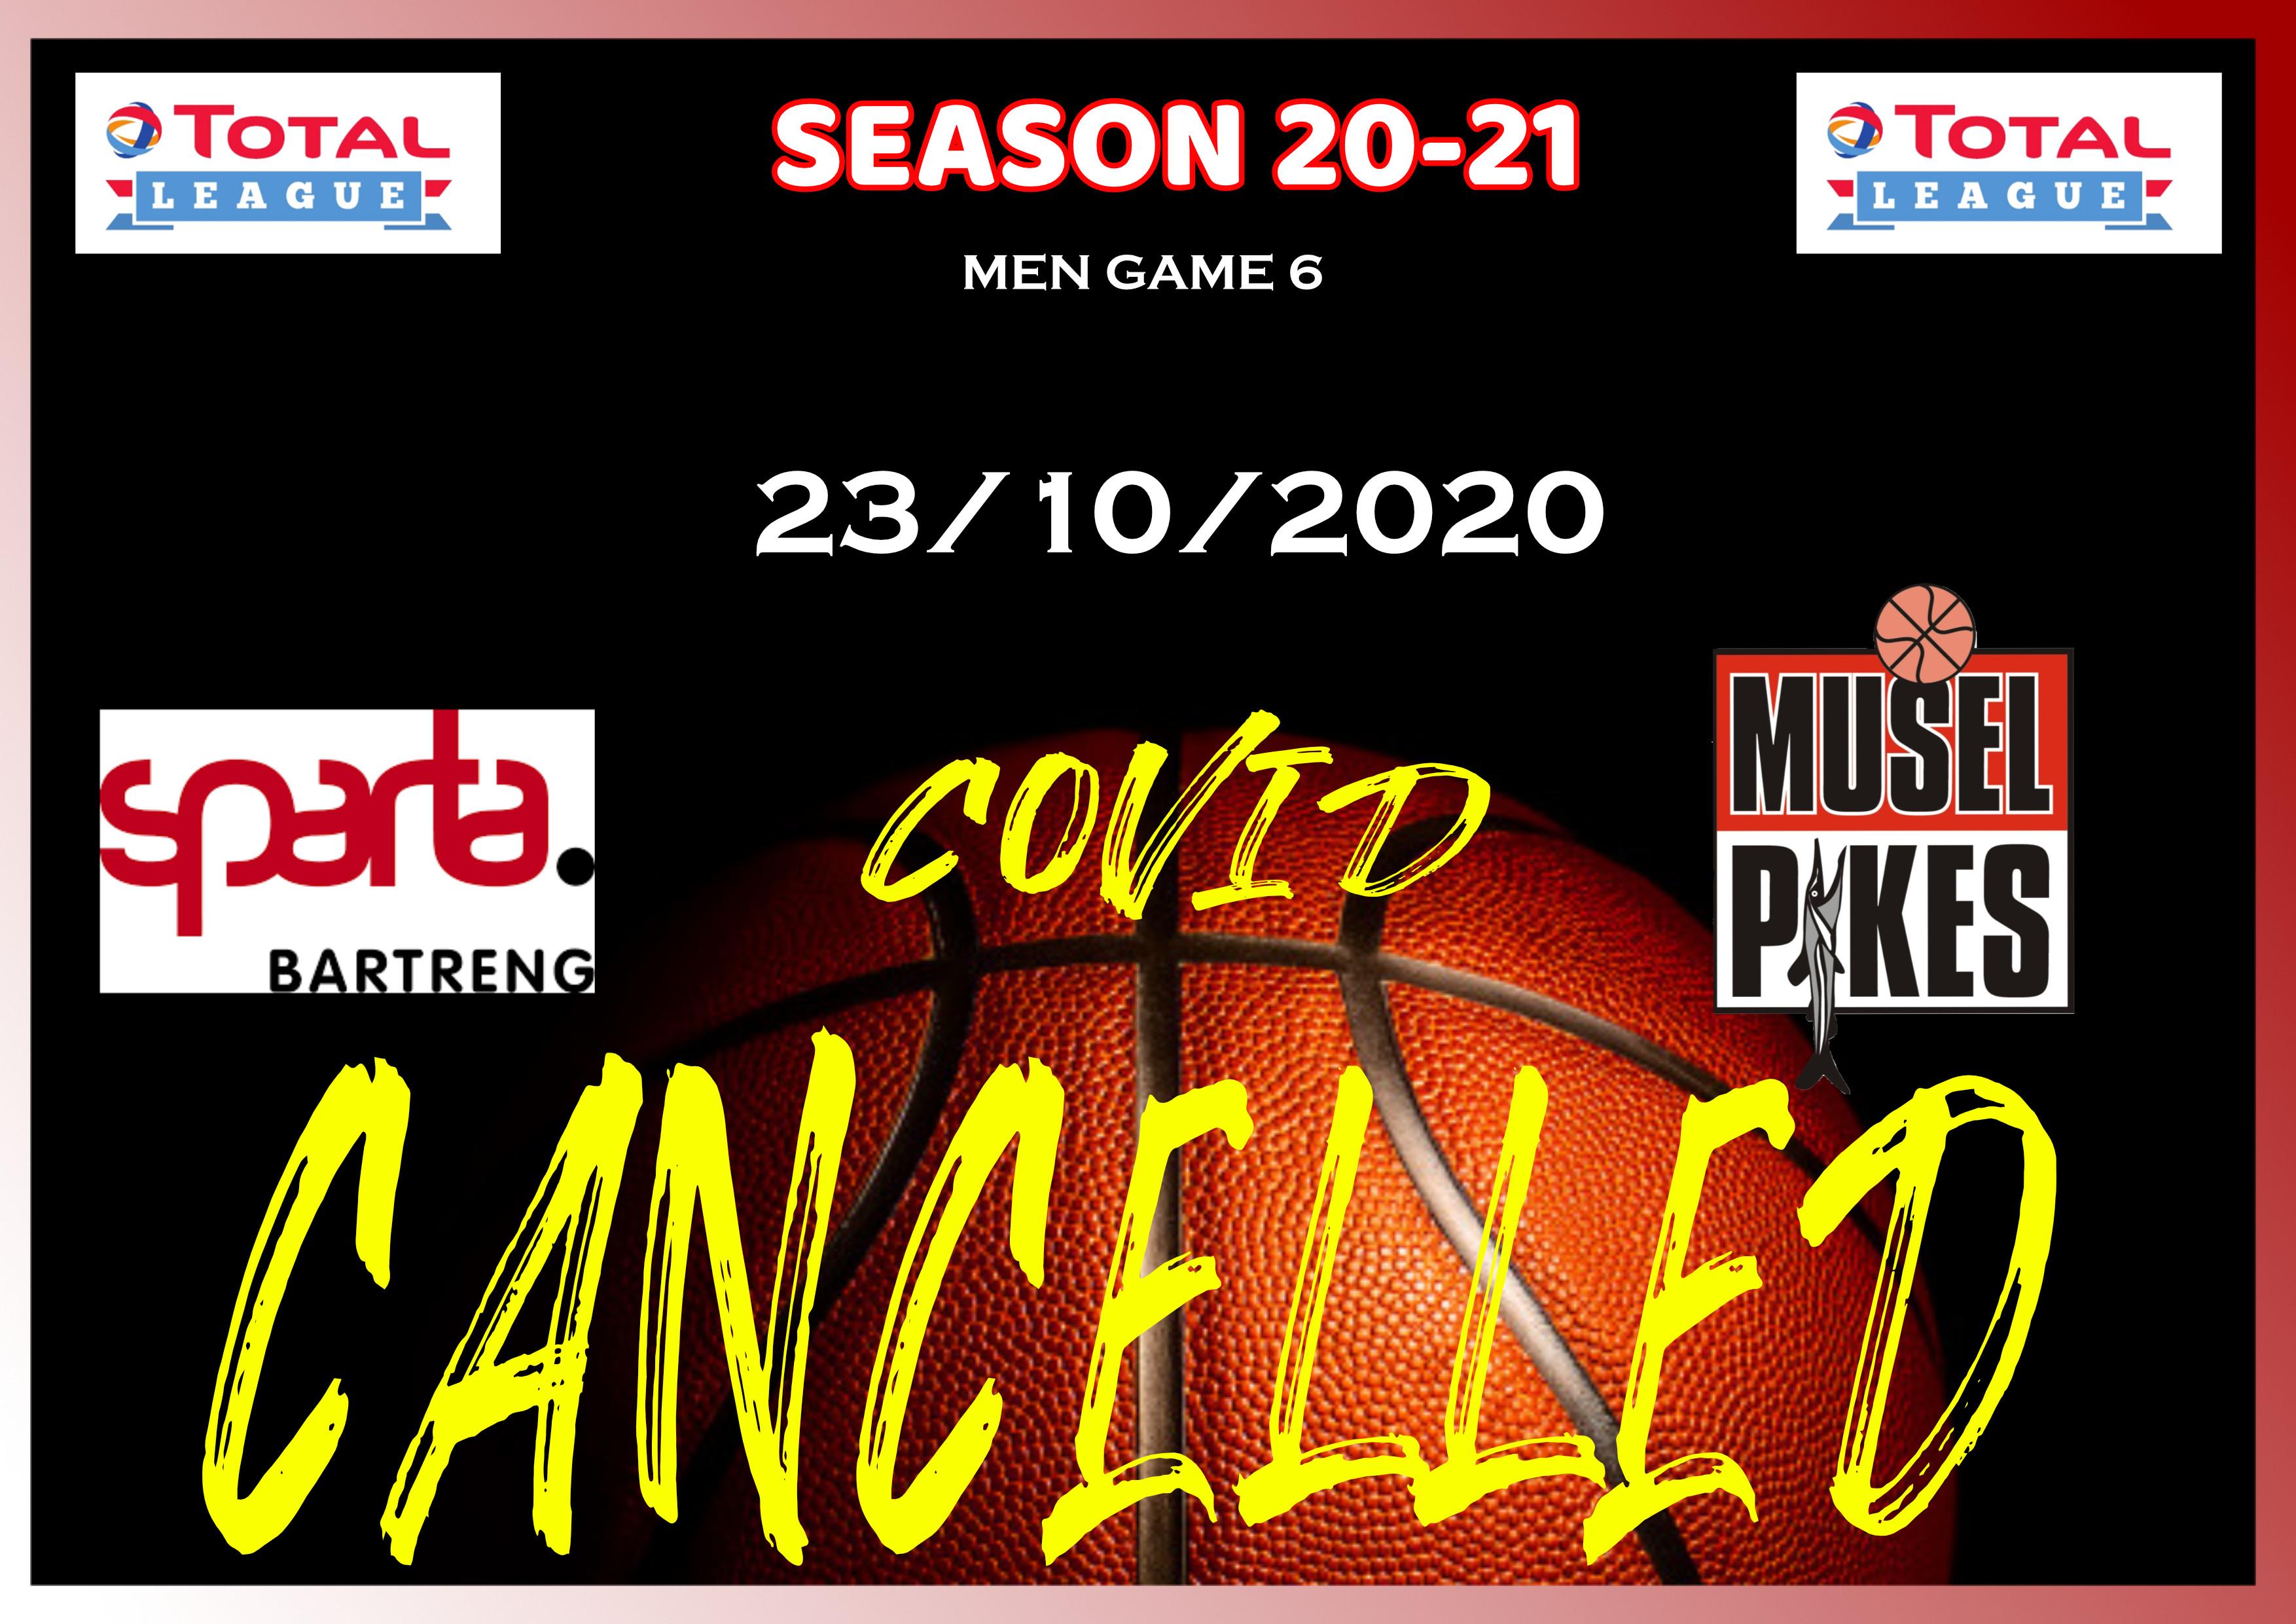 Game 6 men cancelled